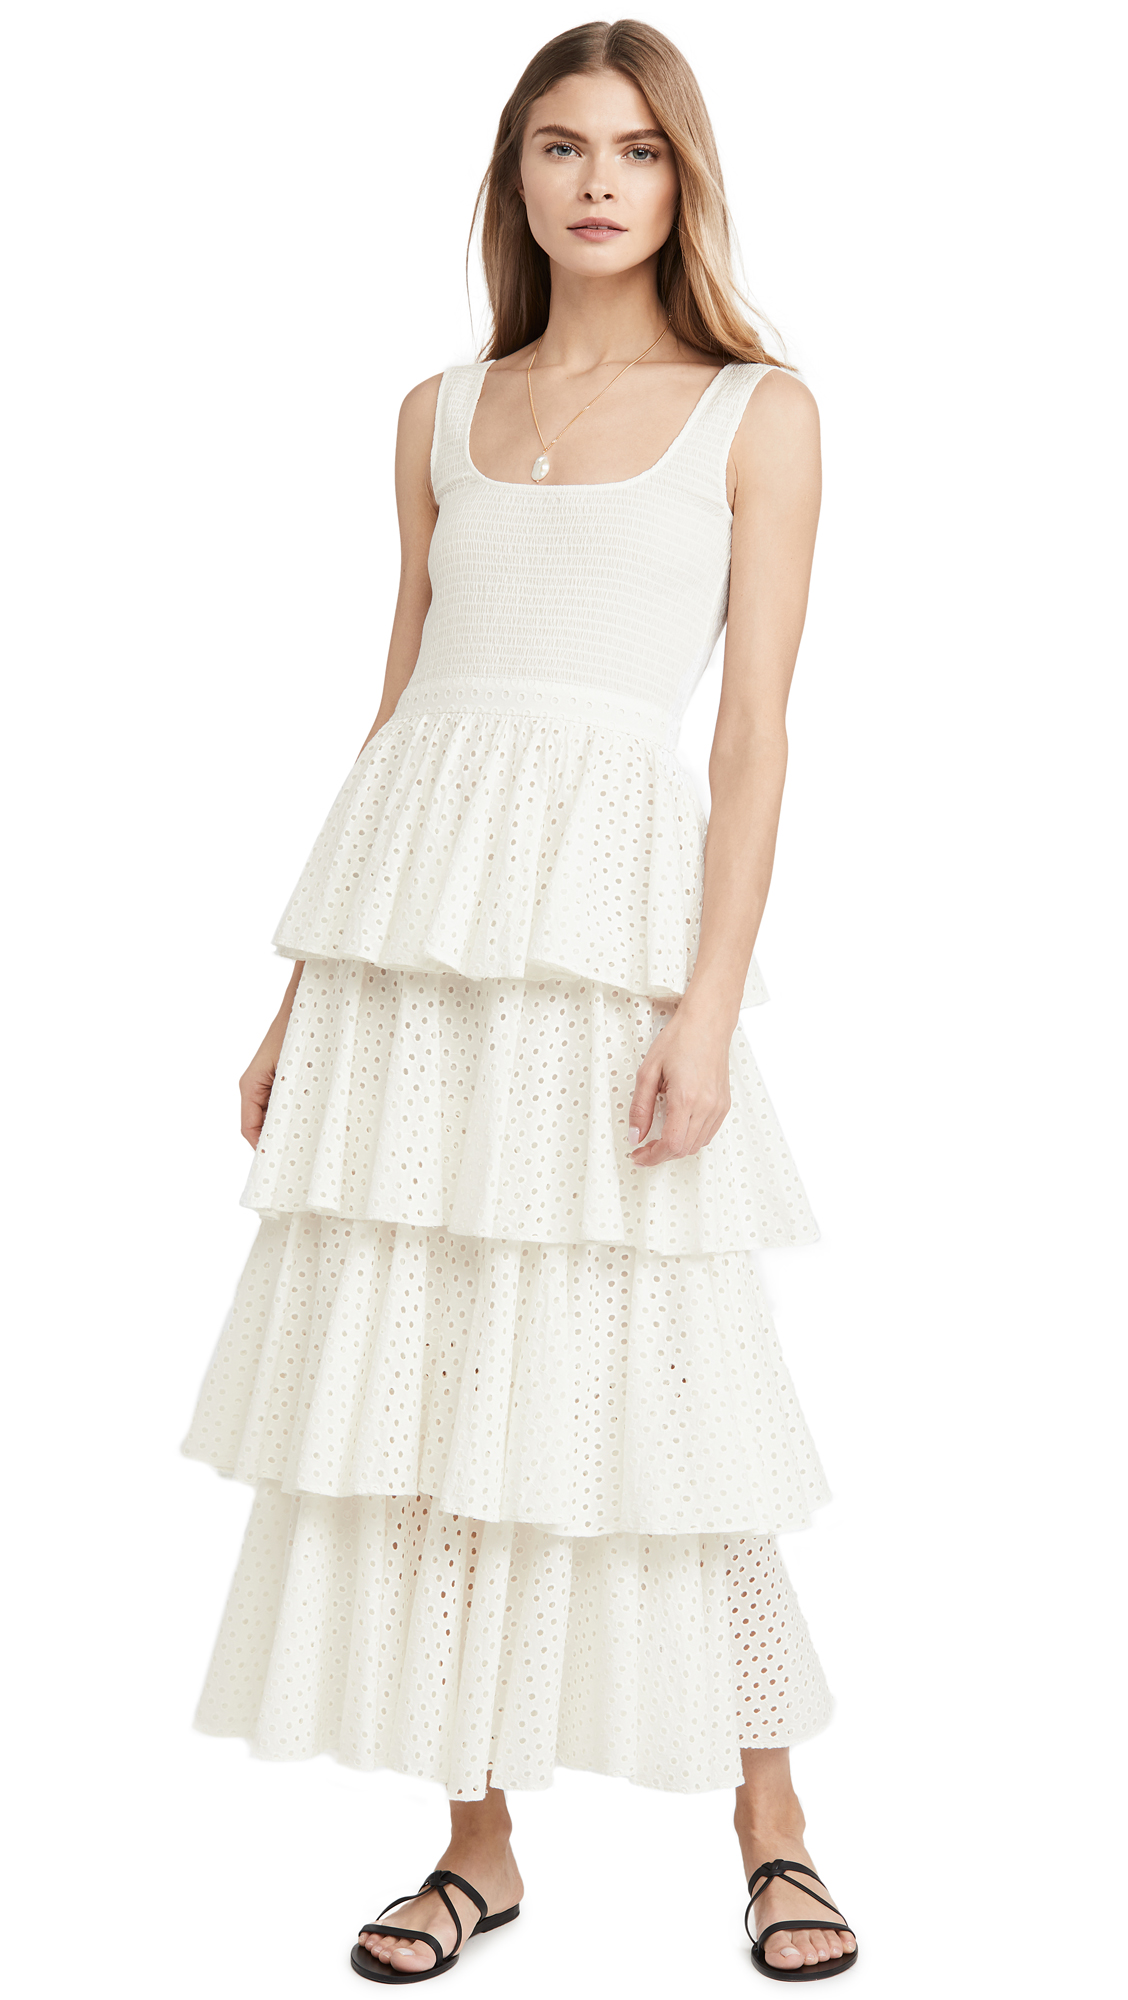 Rhode Naomi Dress